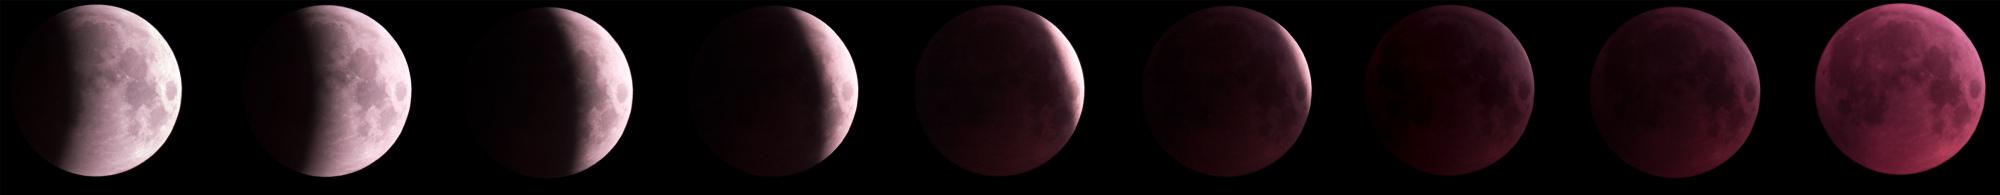 EclipseLune20012019.jpg